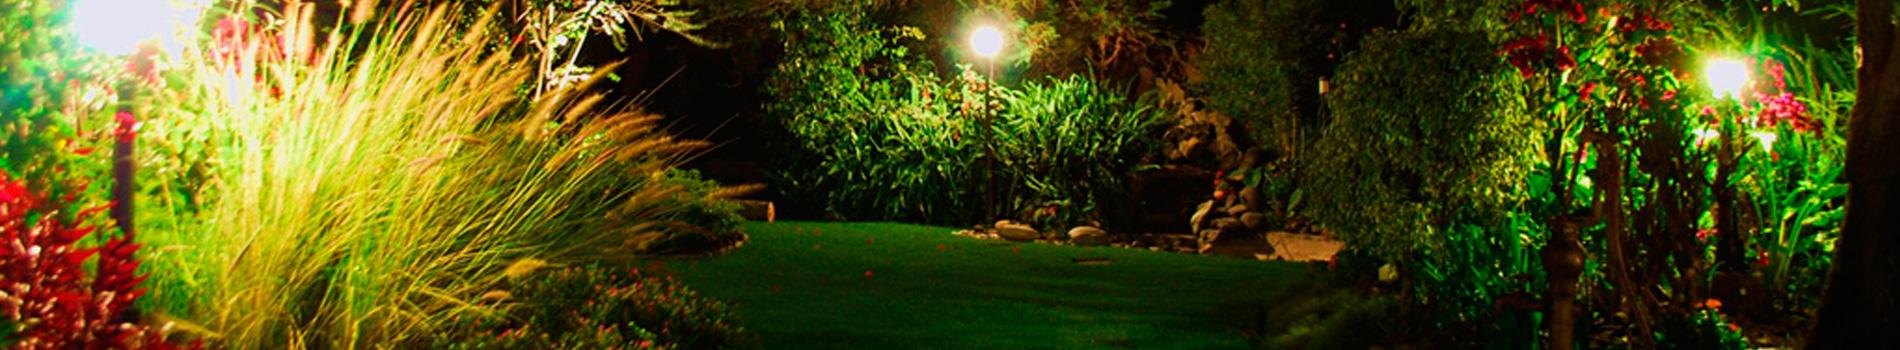 Lumipro iluminacion de exterior en mexico iluminacion para for Iluminacion arboles jardin